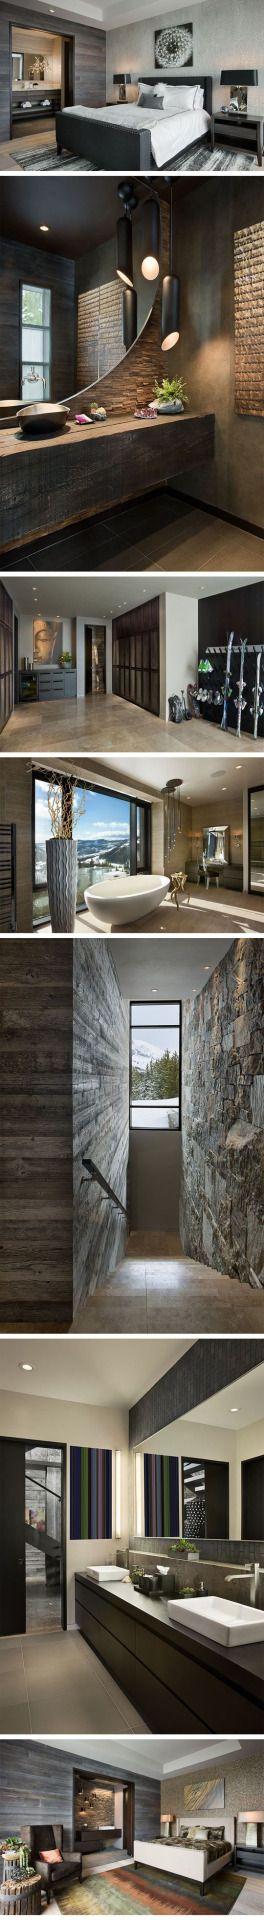 Modern Home Designs : Photo